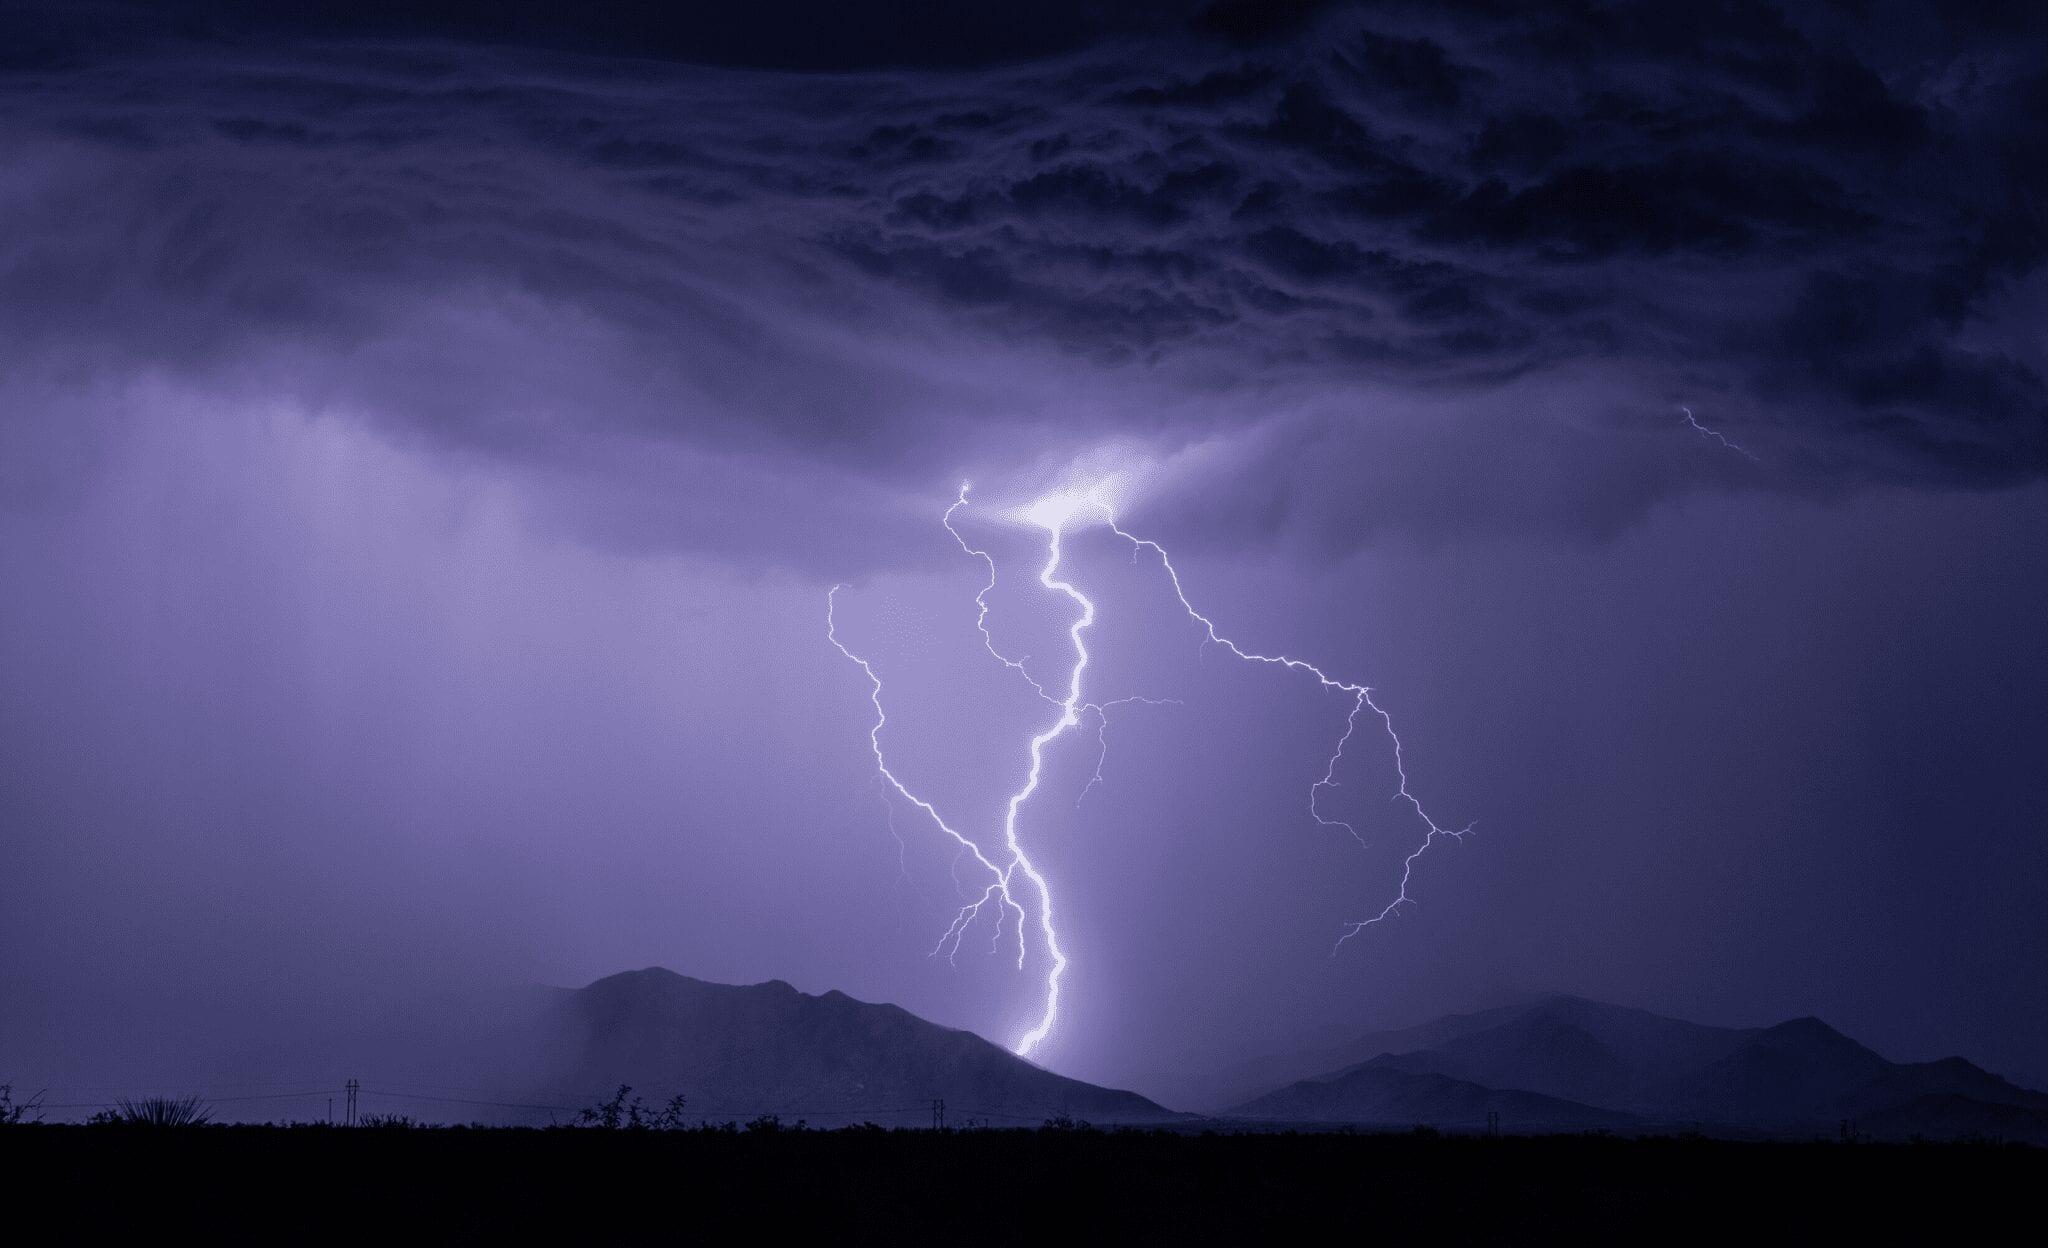 A lightning strike on a dark mountain.